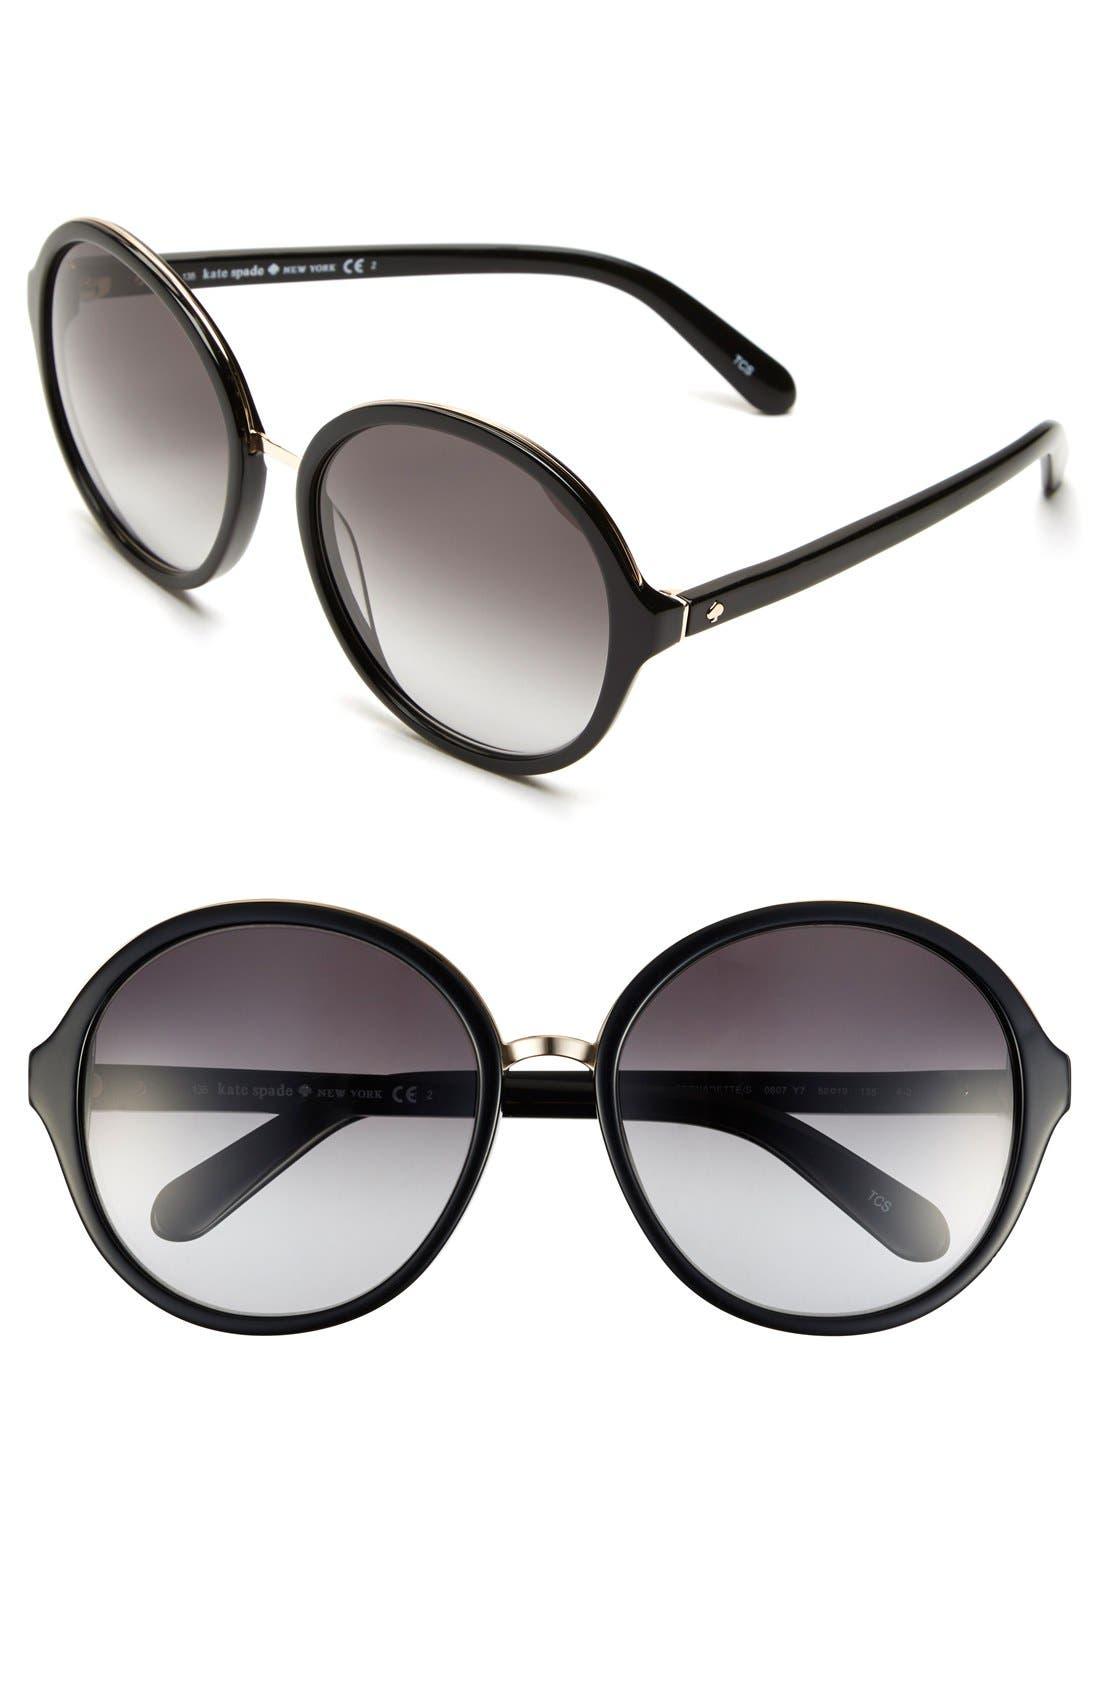 Main Image - kate spade new york 'bernadette' 58mm gradient sunglasses